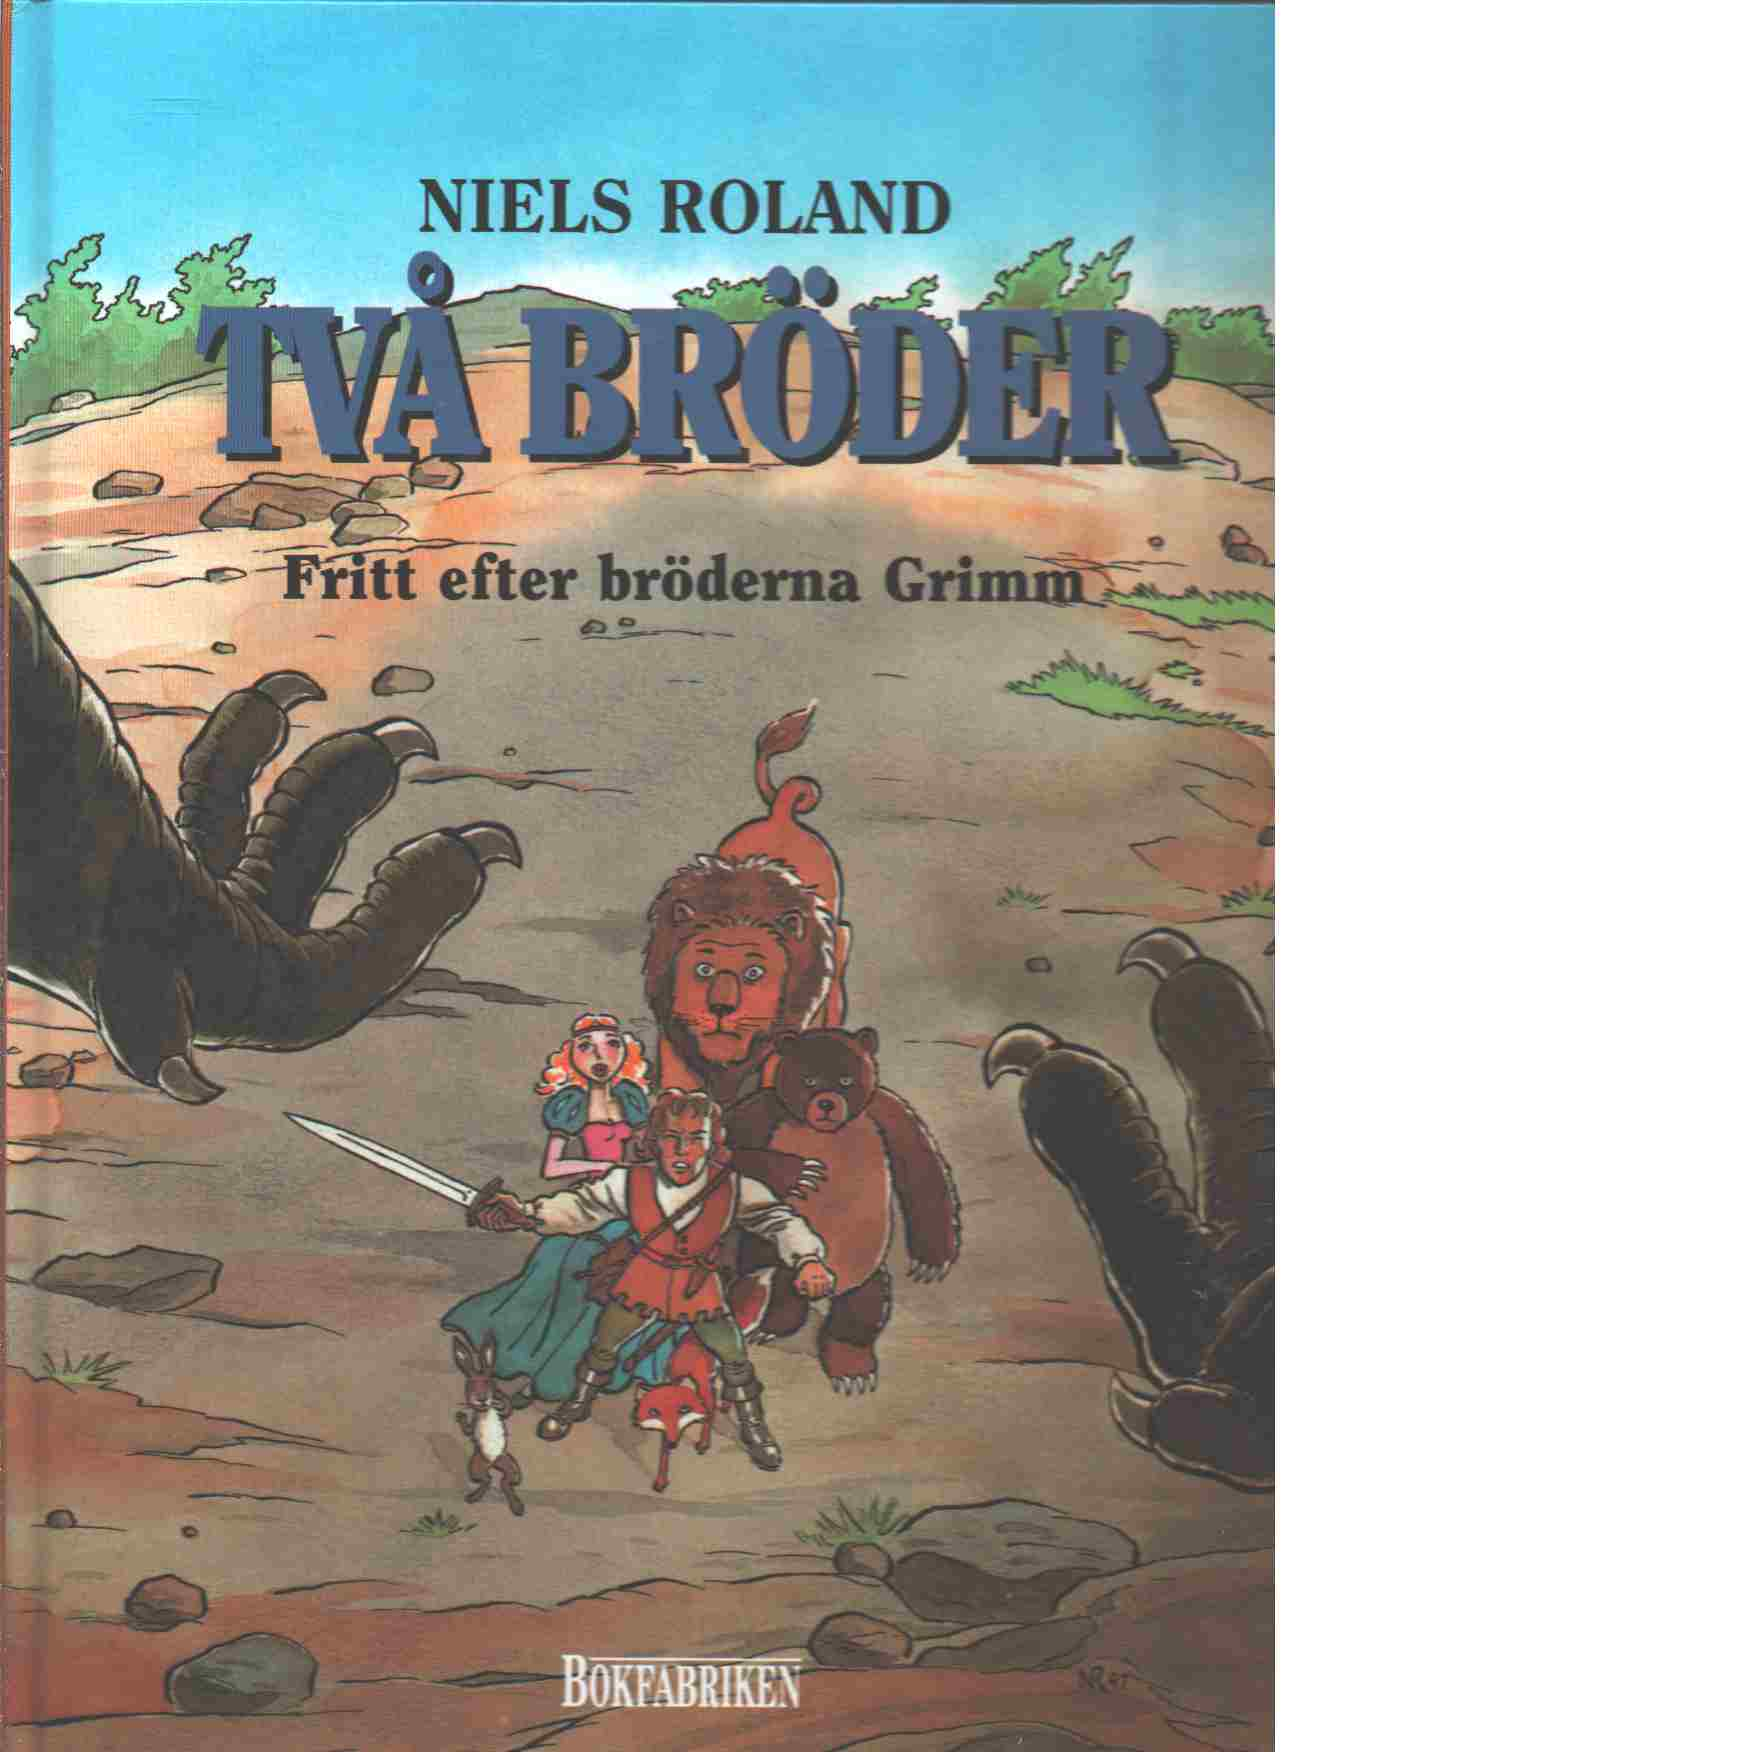 Två bröder - Roland, Niels